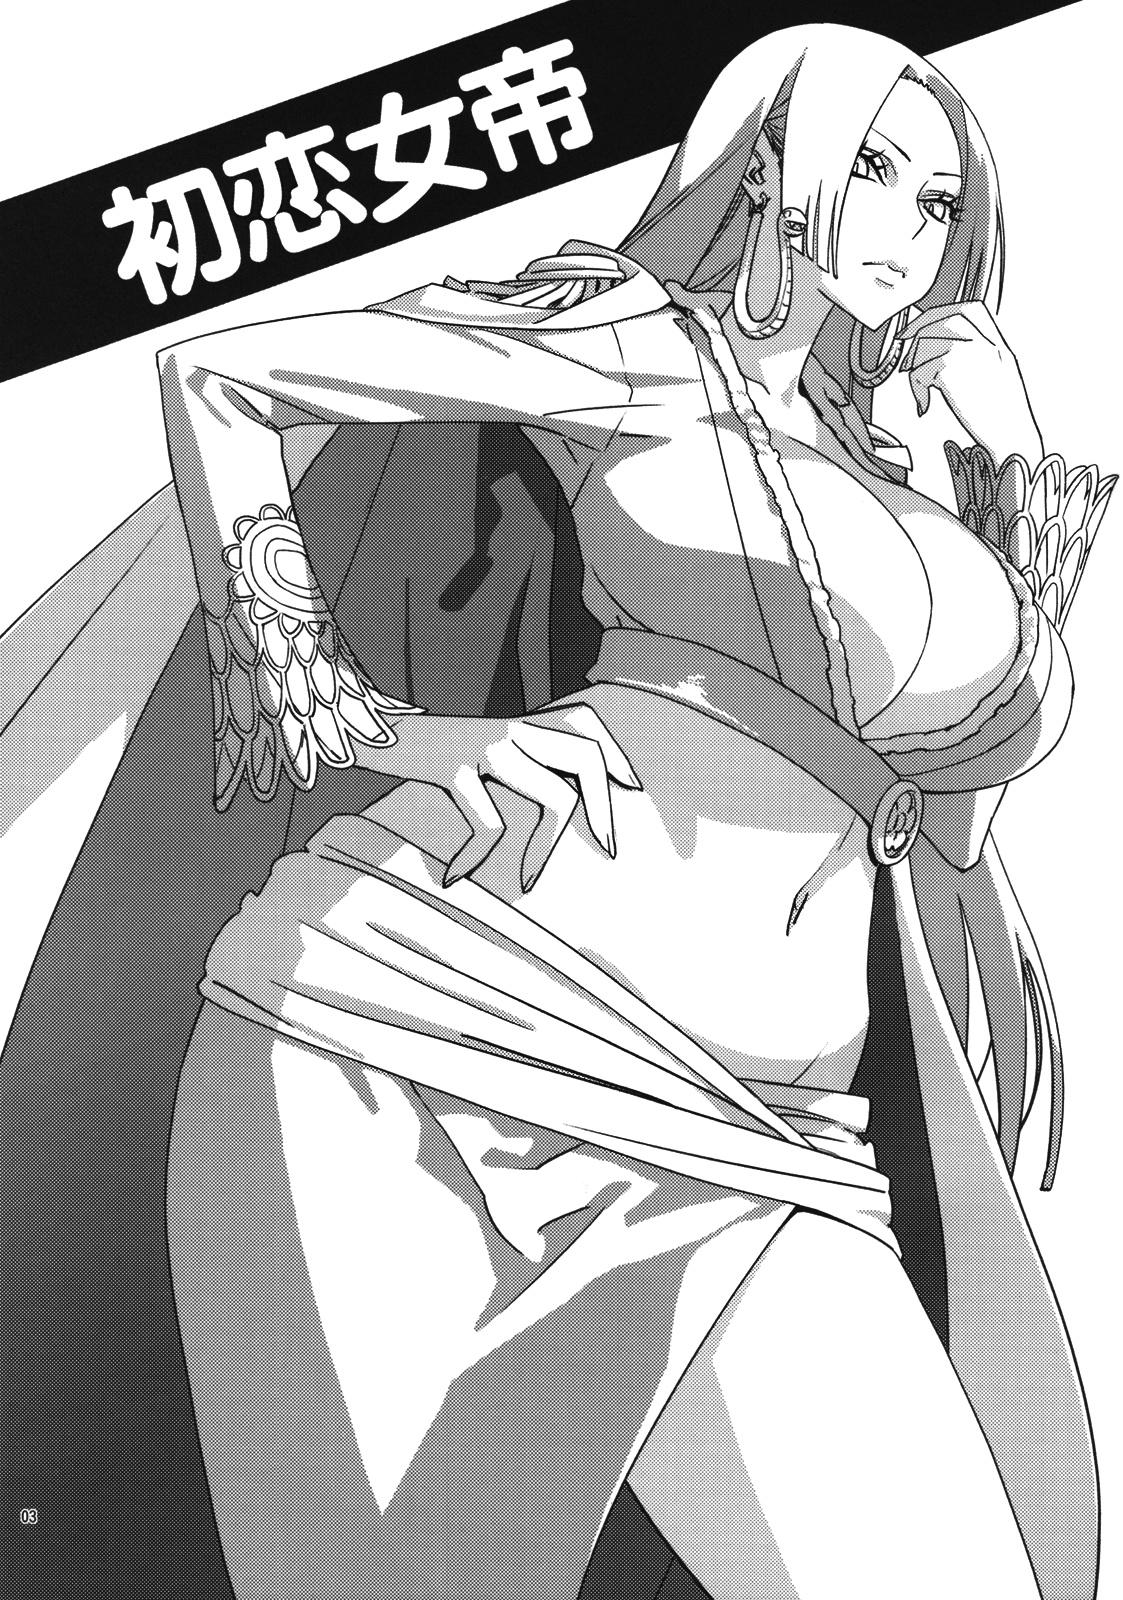 Abradeli Kamitaba No.04 Hatsukoi Jotei 3